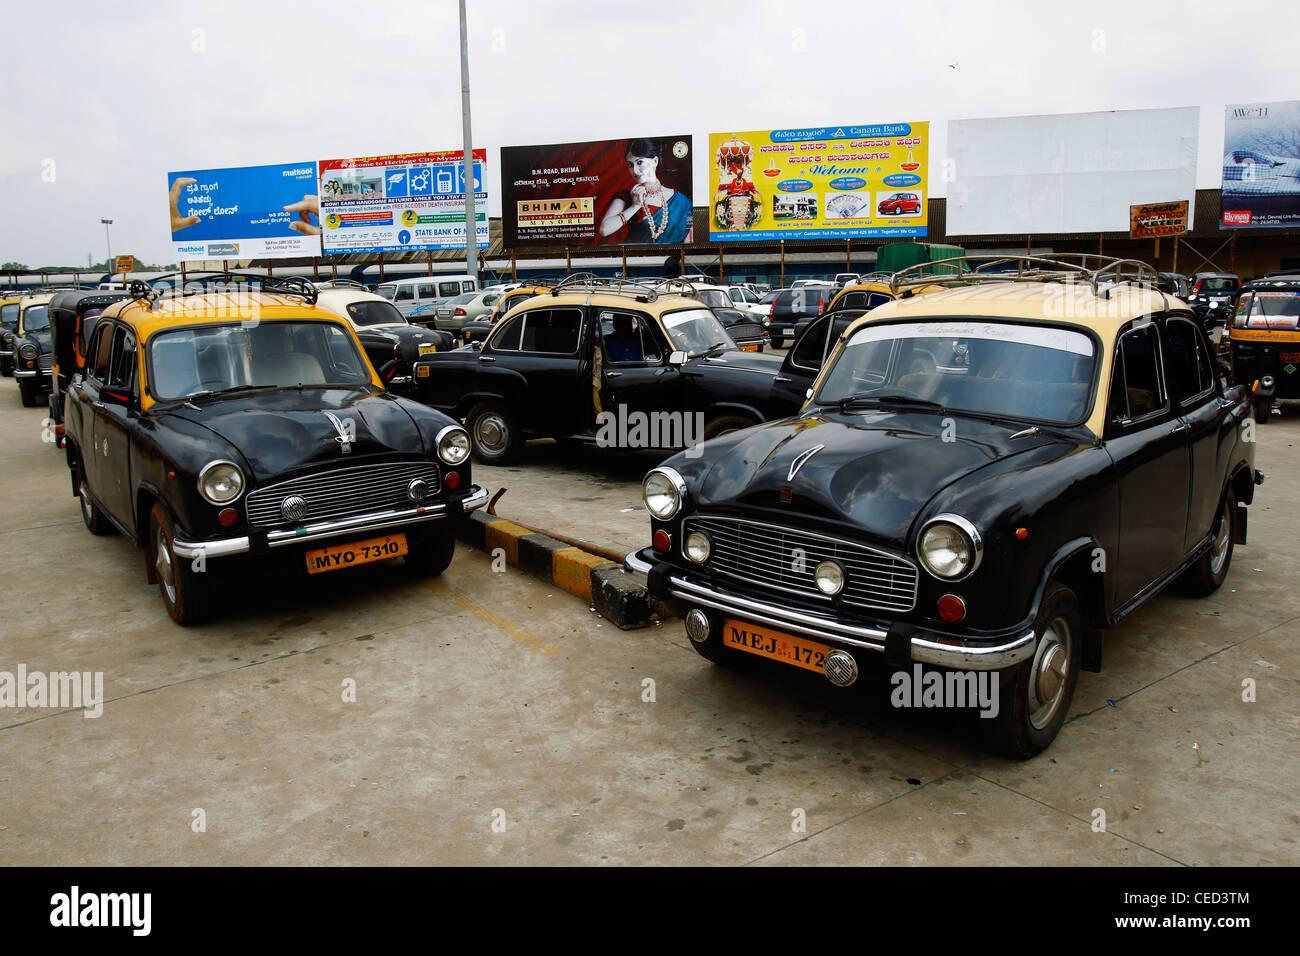 Hindustan Ambassador taxis at Mysore Railway Station, Karnataka, India - Stock Image